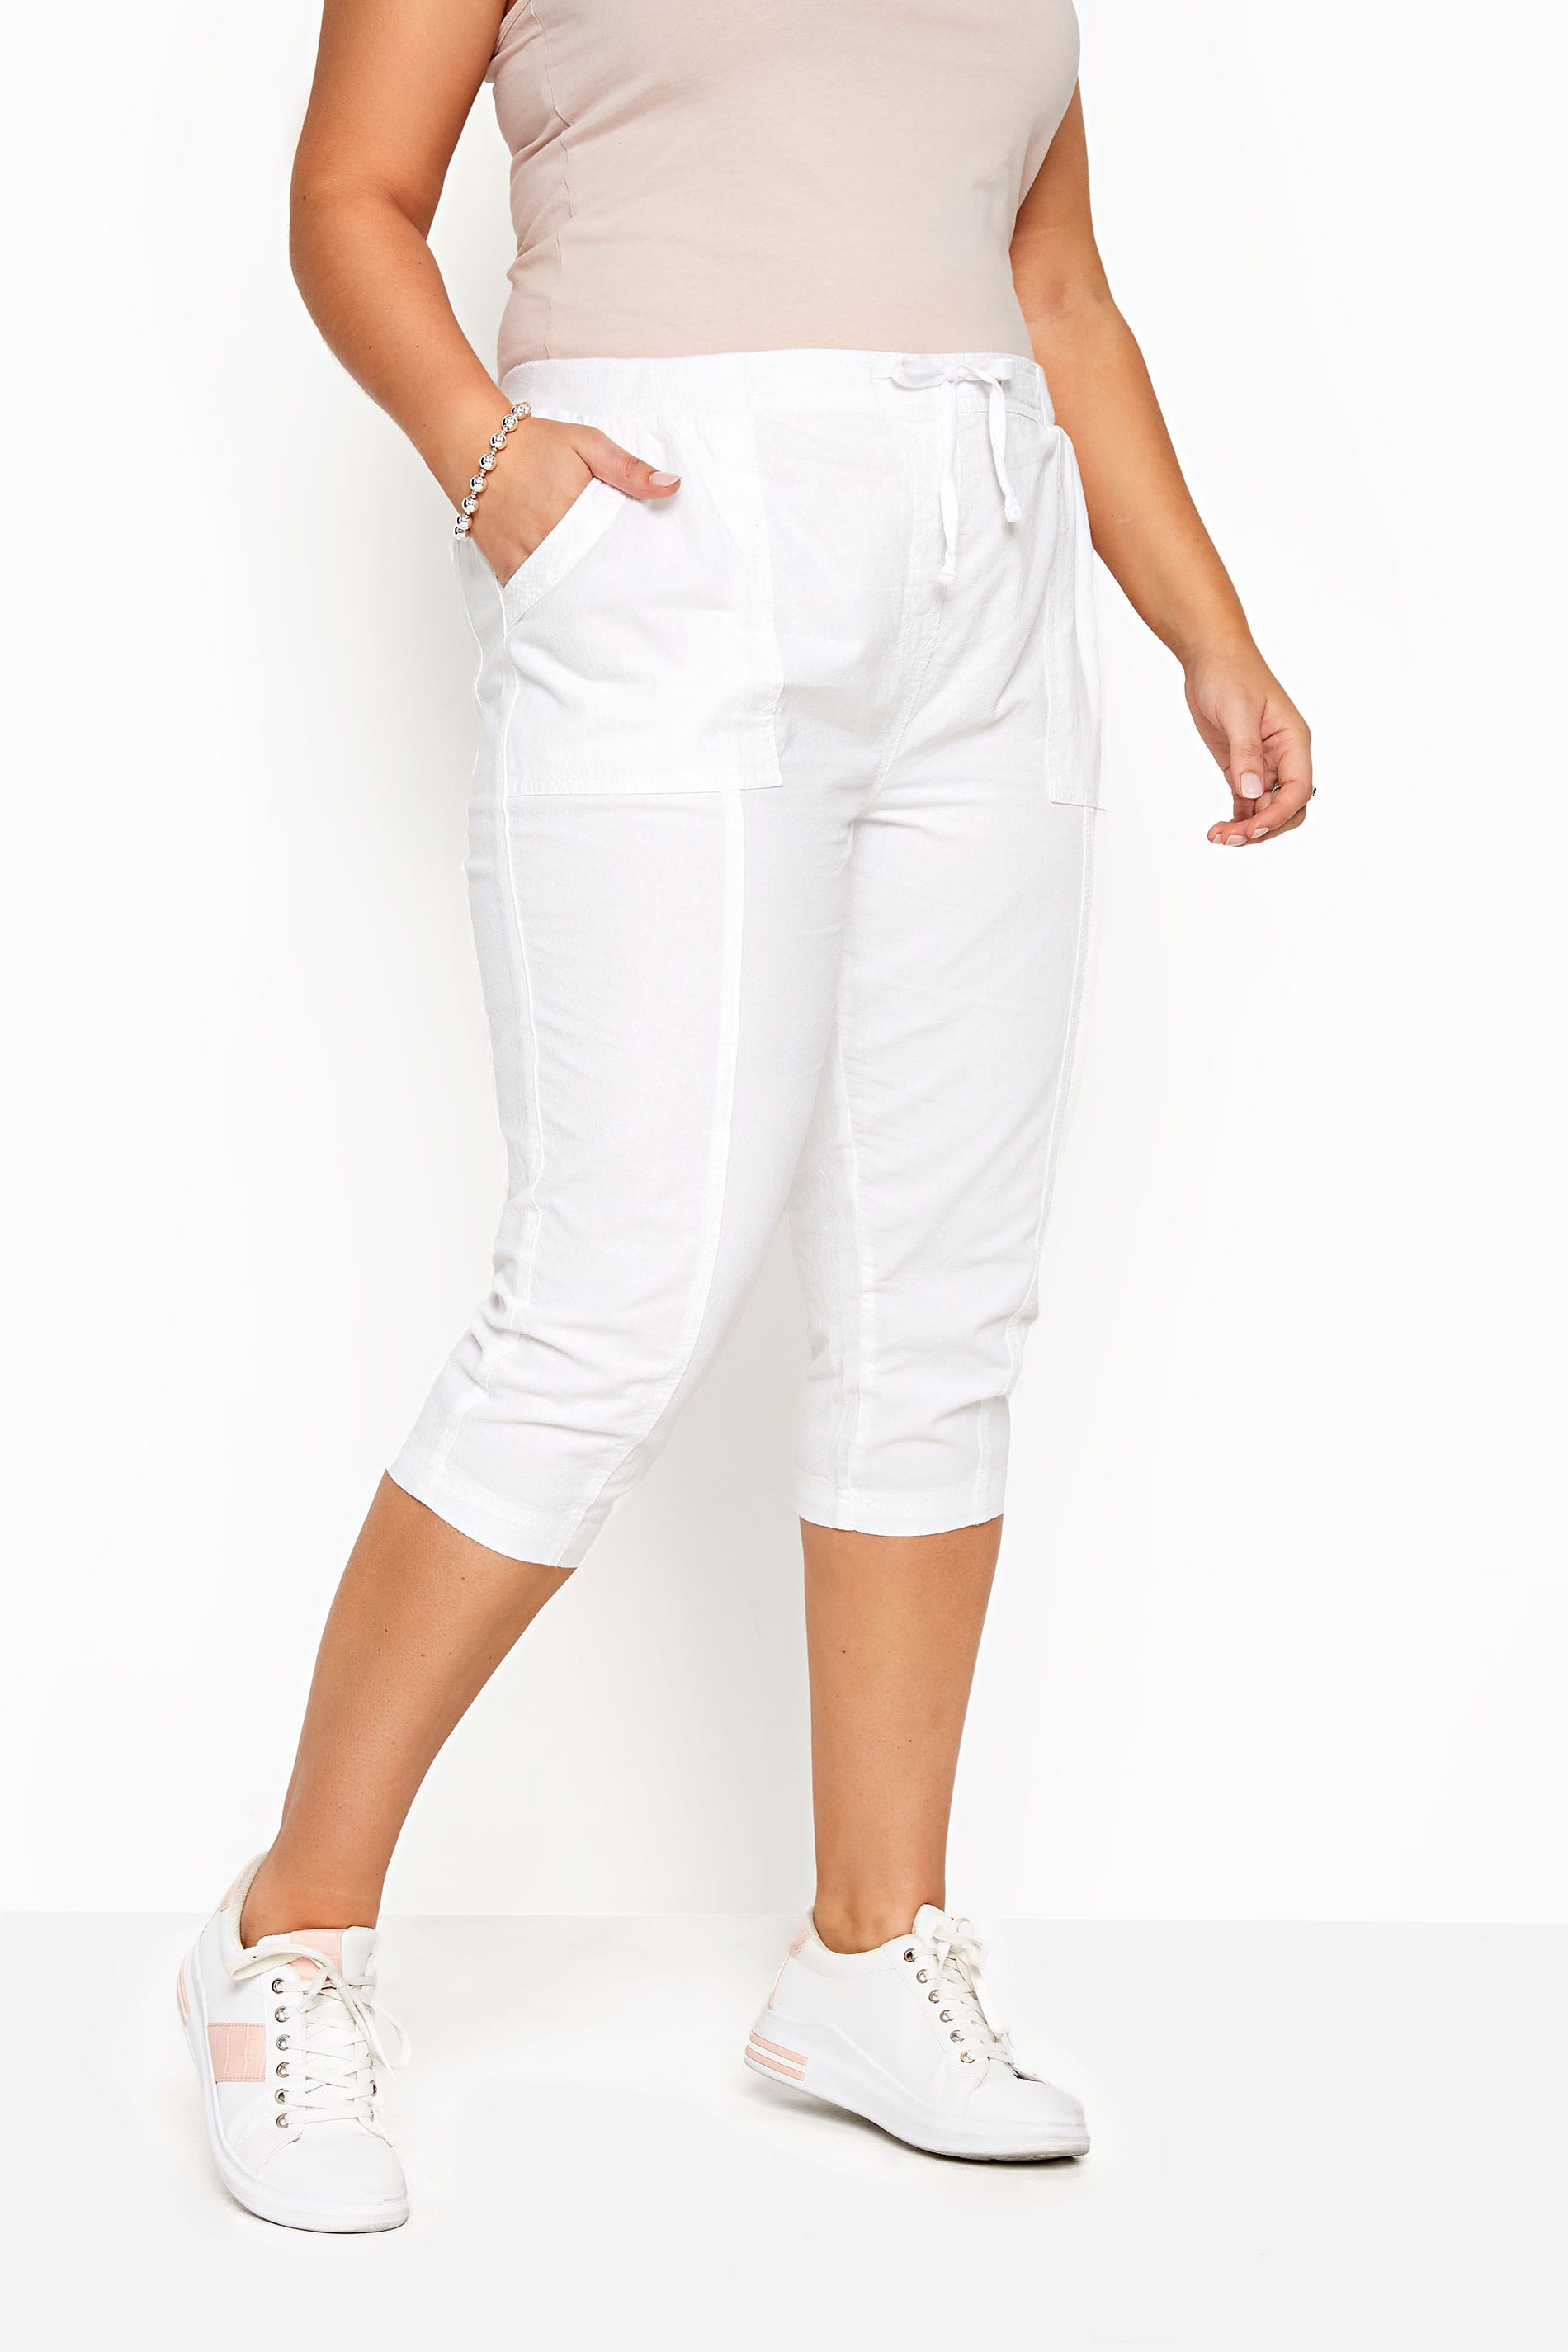 Pantalones Blancos Capri Algodon Fresco Tallas Grandes 44 A 64 Yours Clothing